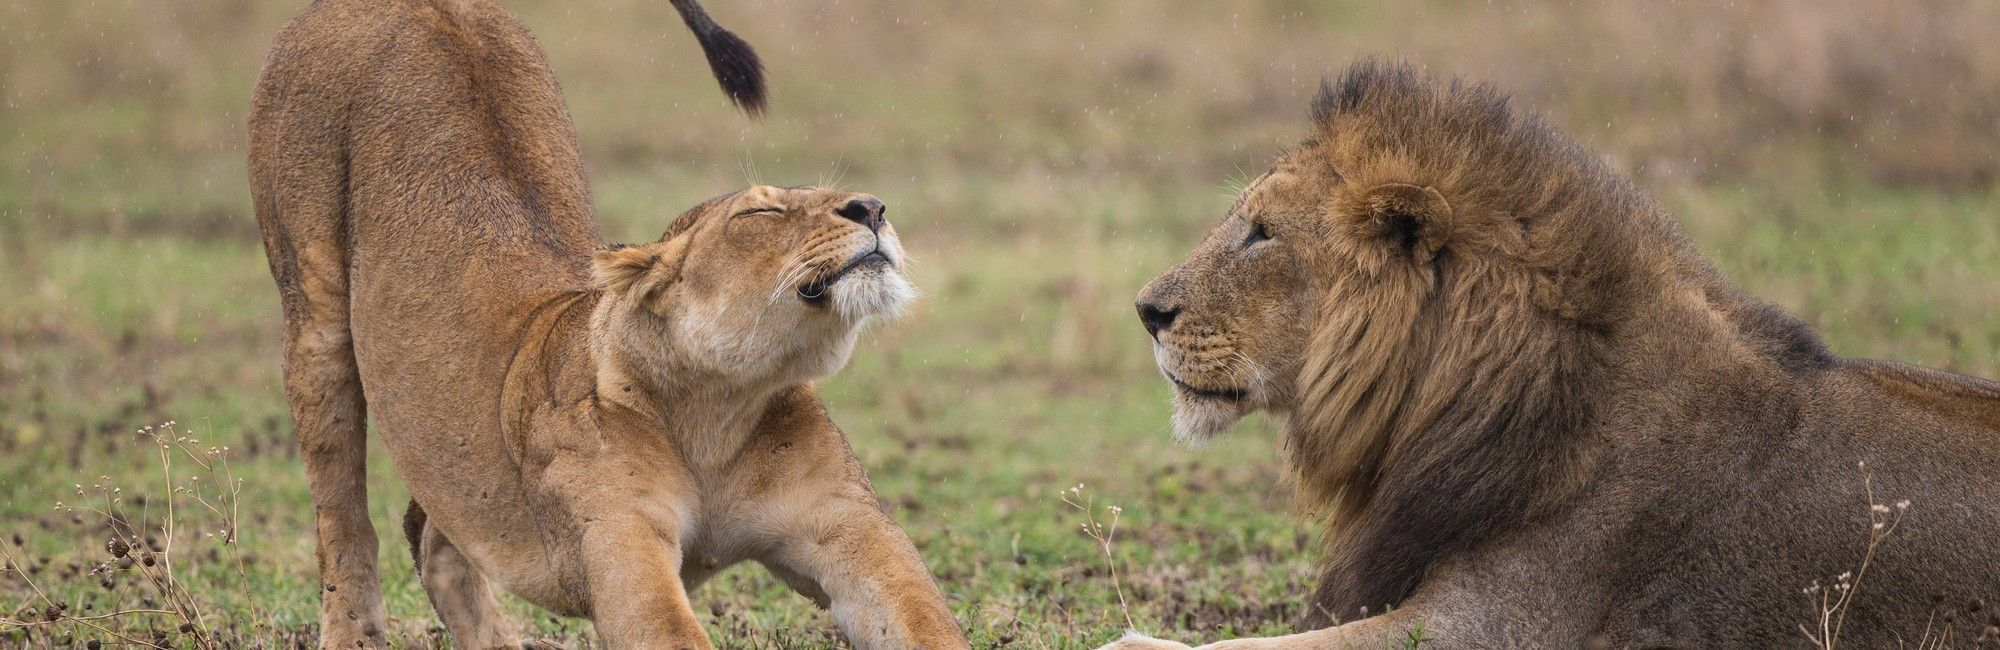 Zuid-Afrika leeuw